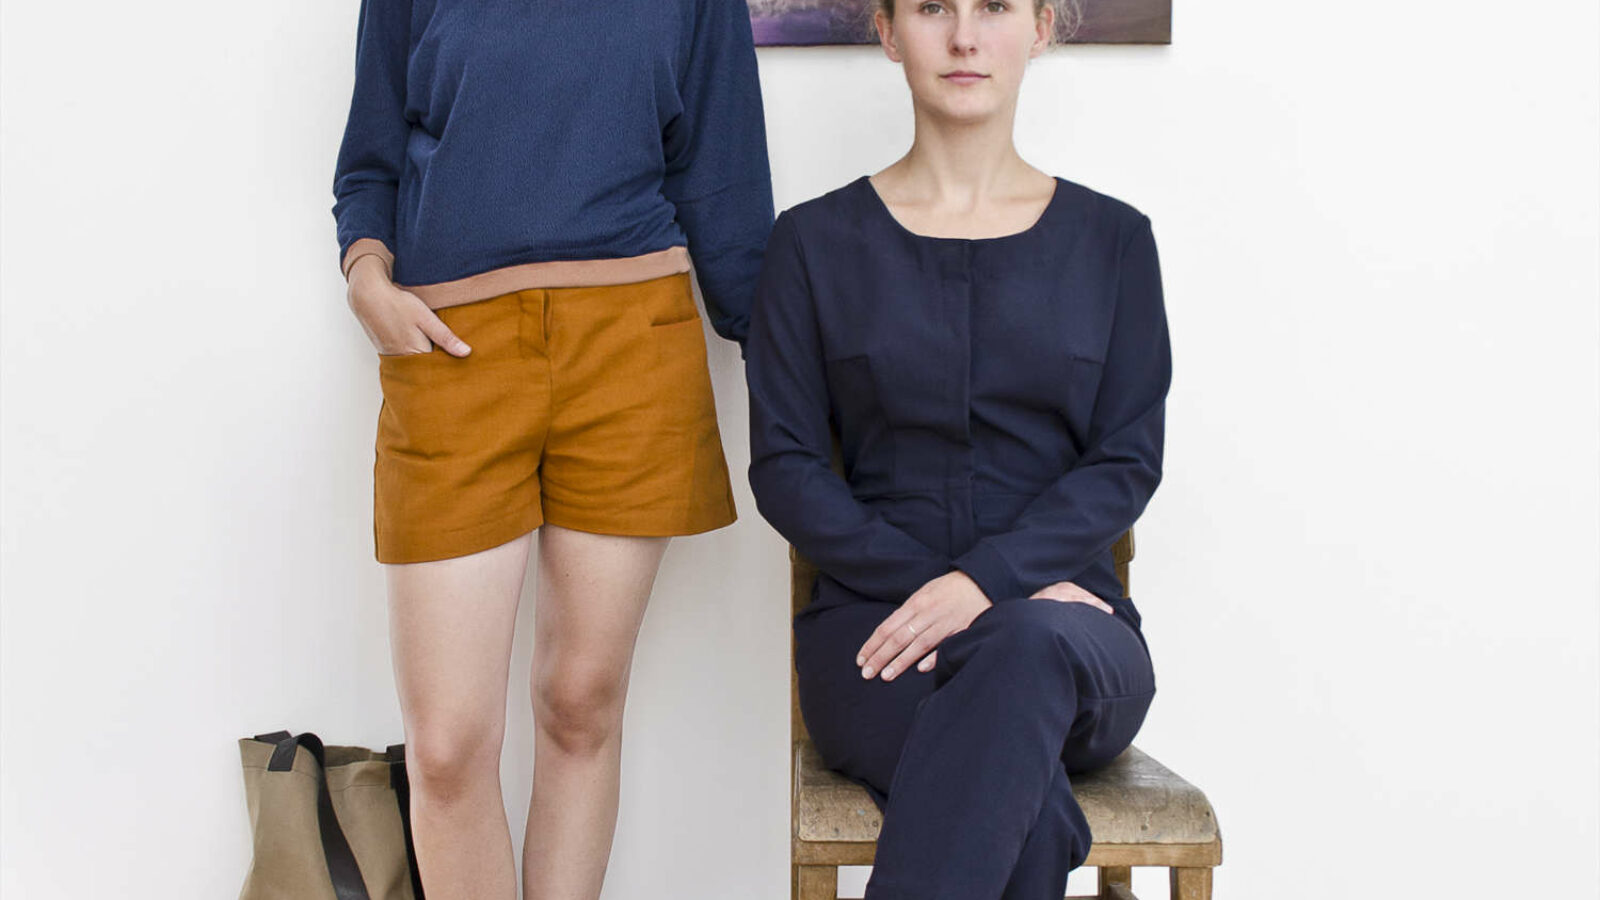 Malerei, Mode & Mitmachkurse im Atelier Dittmer